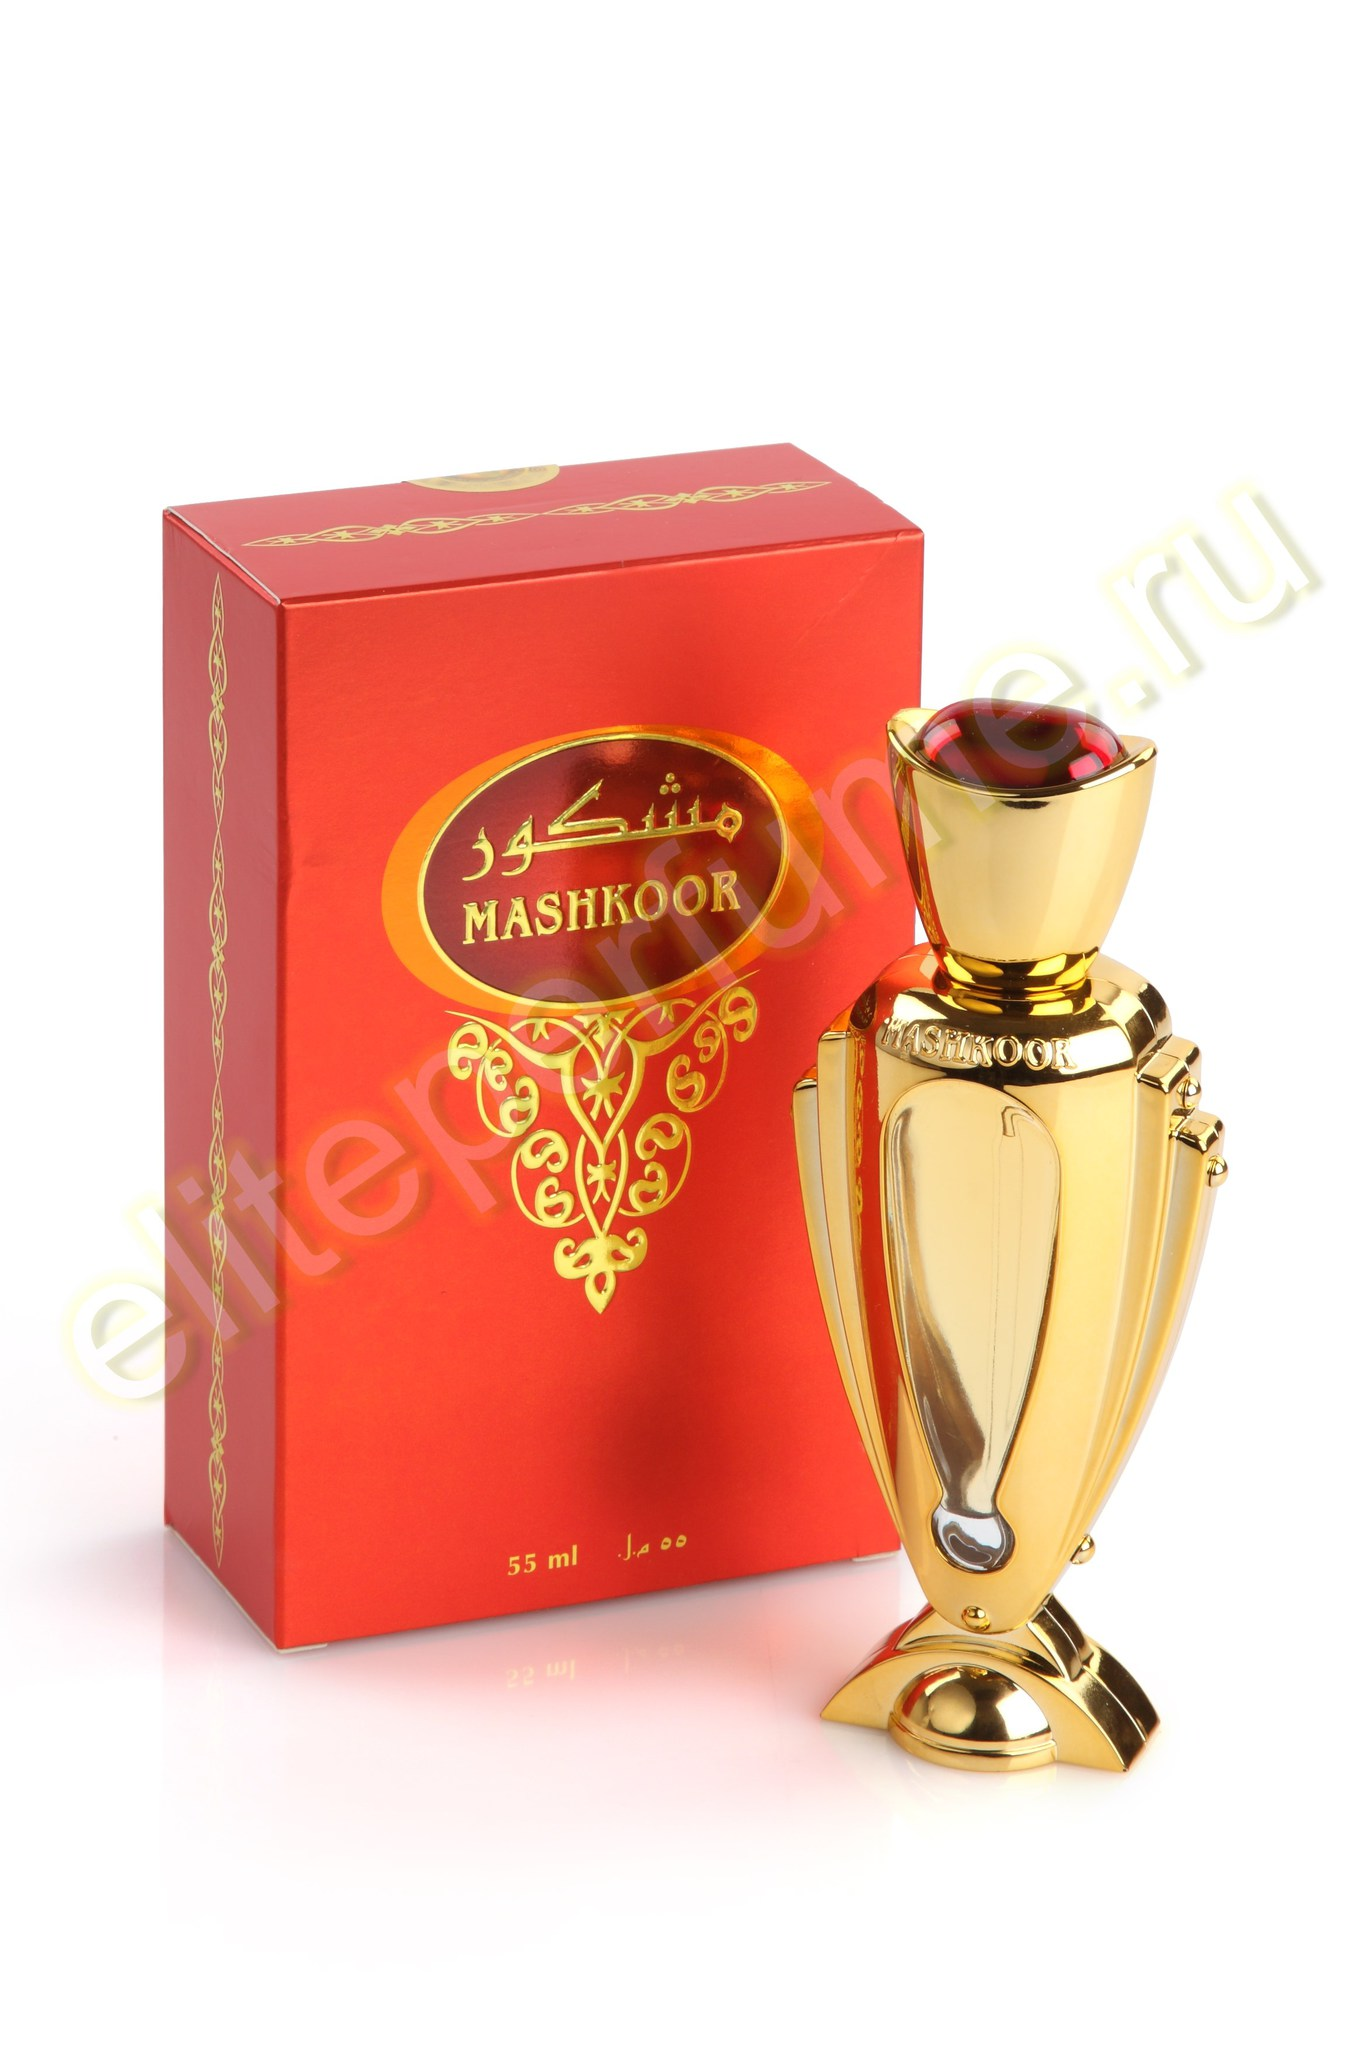 Mashkoor Машкур 55 мл спрей от Аль Харамайн Al Haramain Perfumes